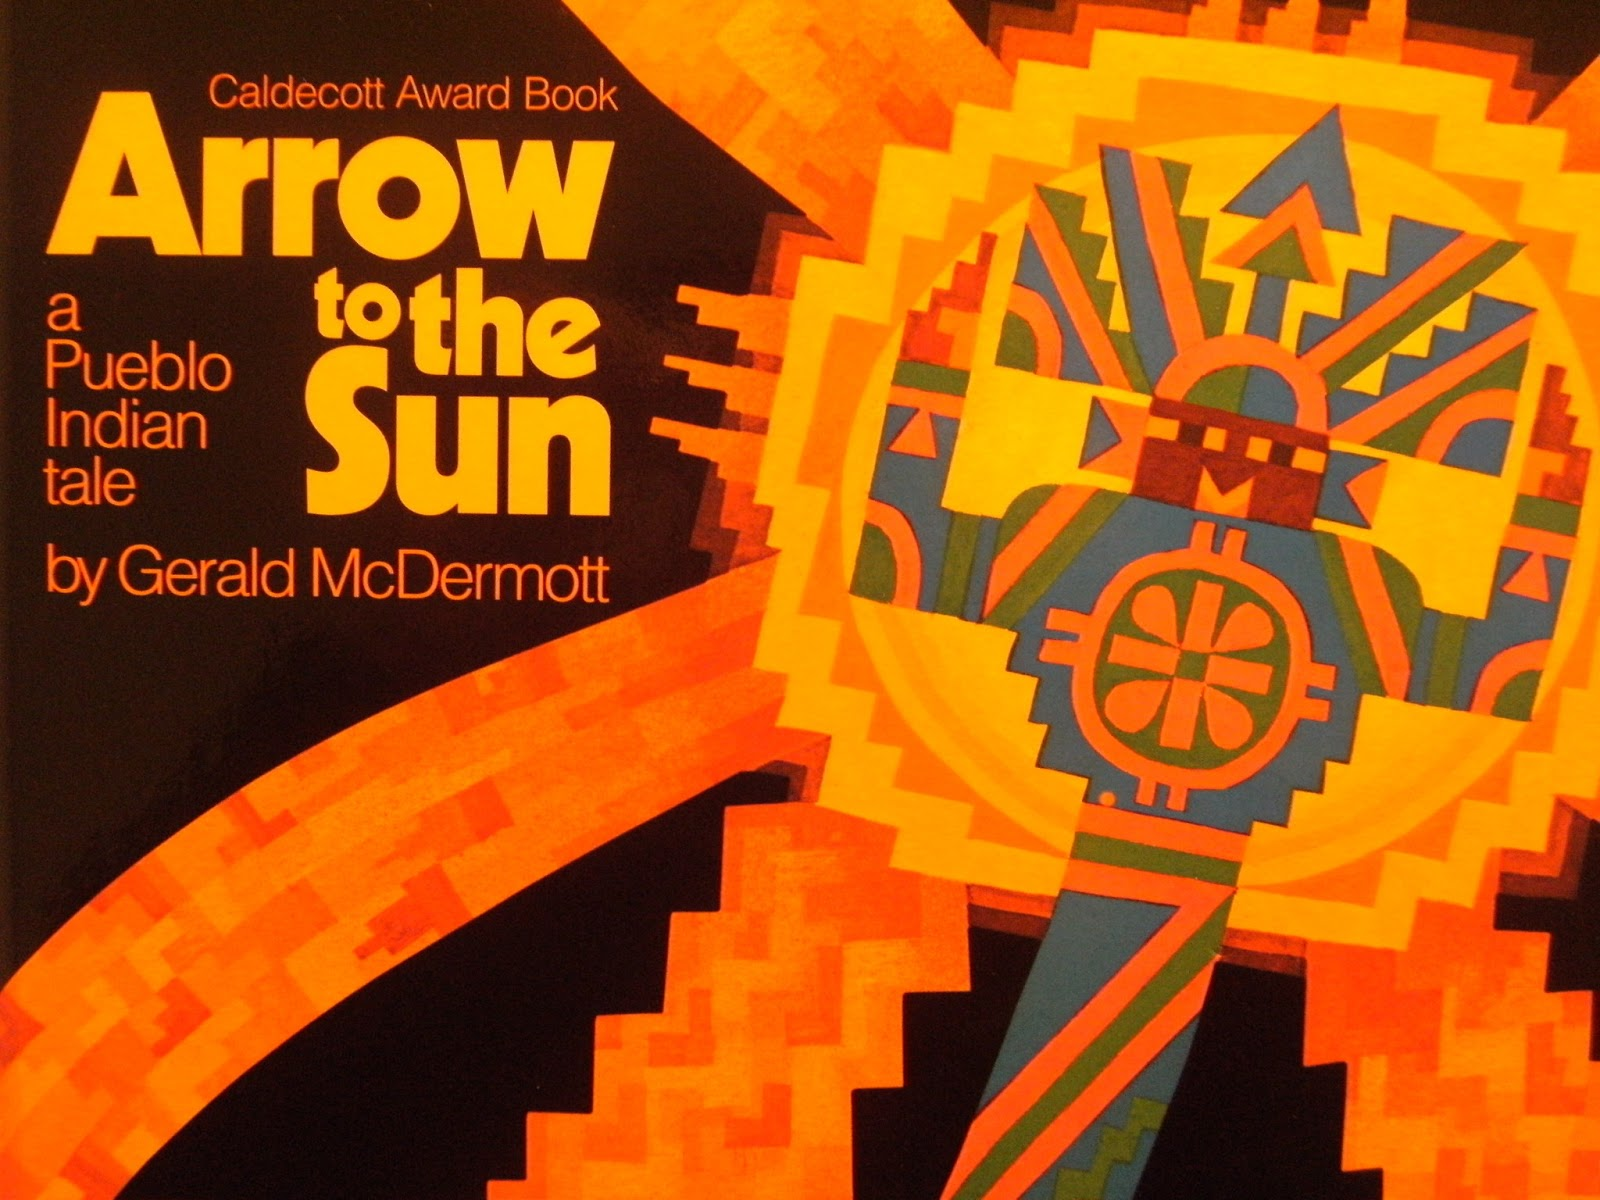 Caldecott Book Arrow To The Sun